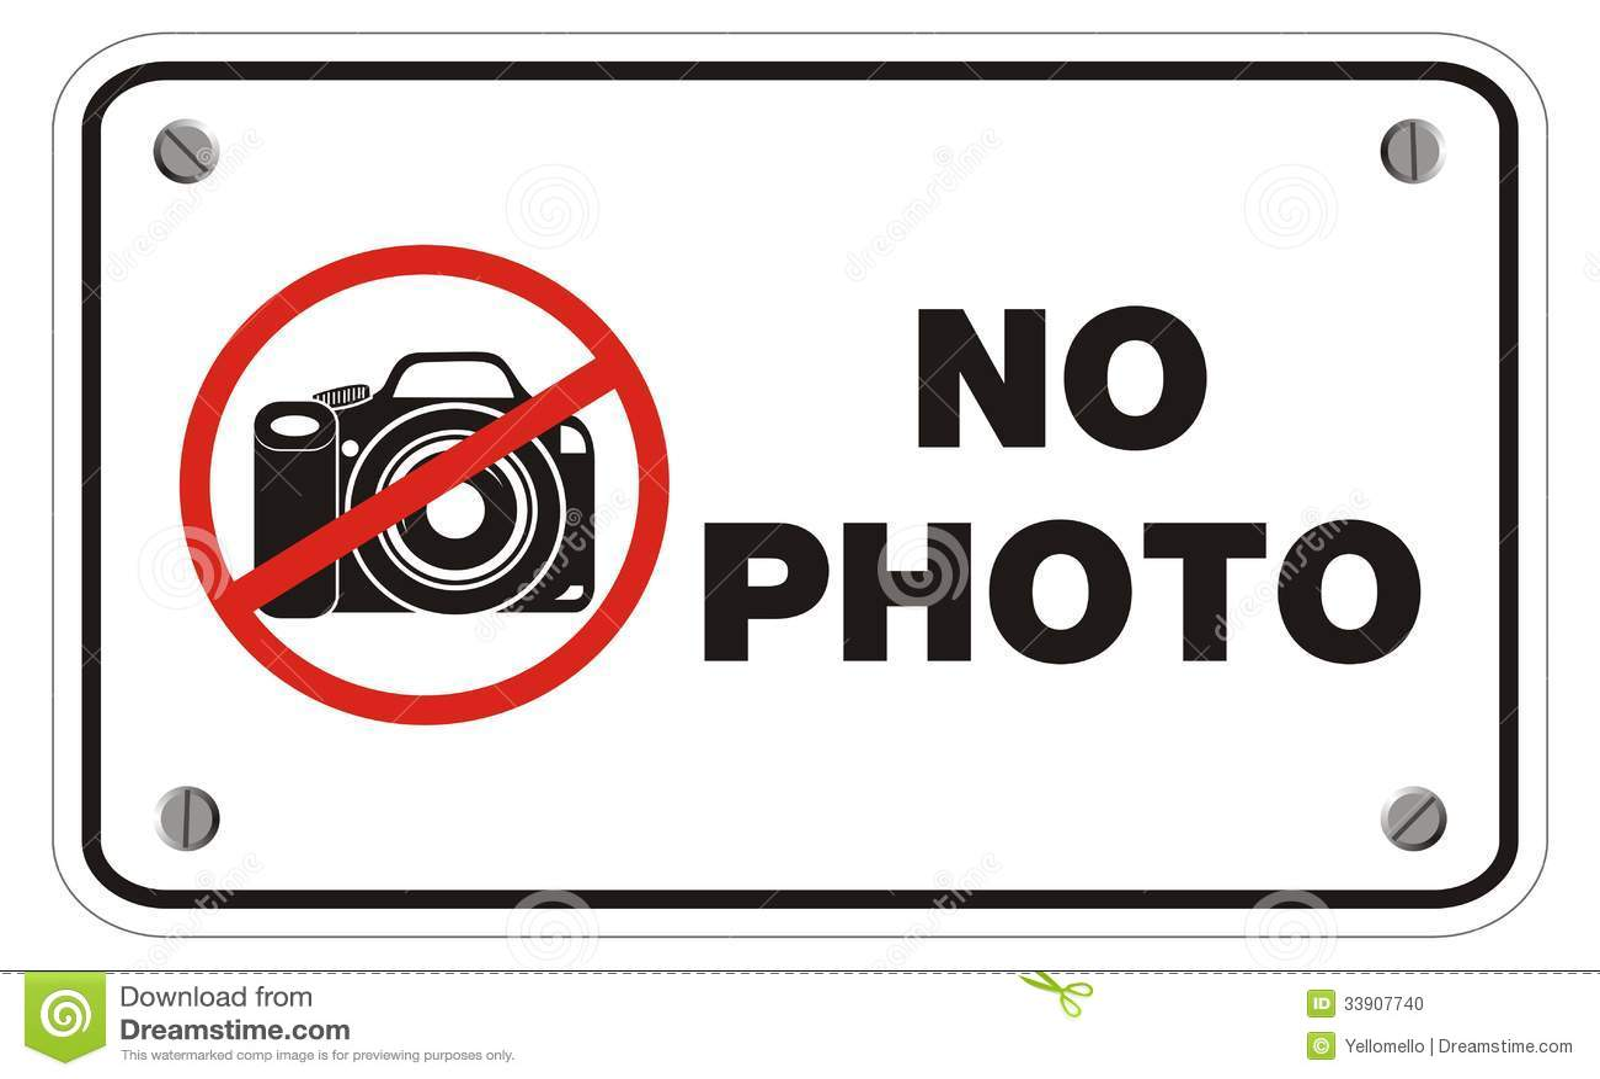 define brightness and contrast in digital image processing v1o